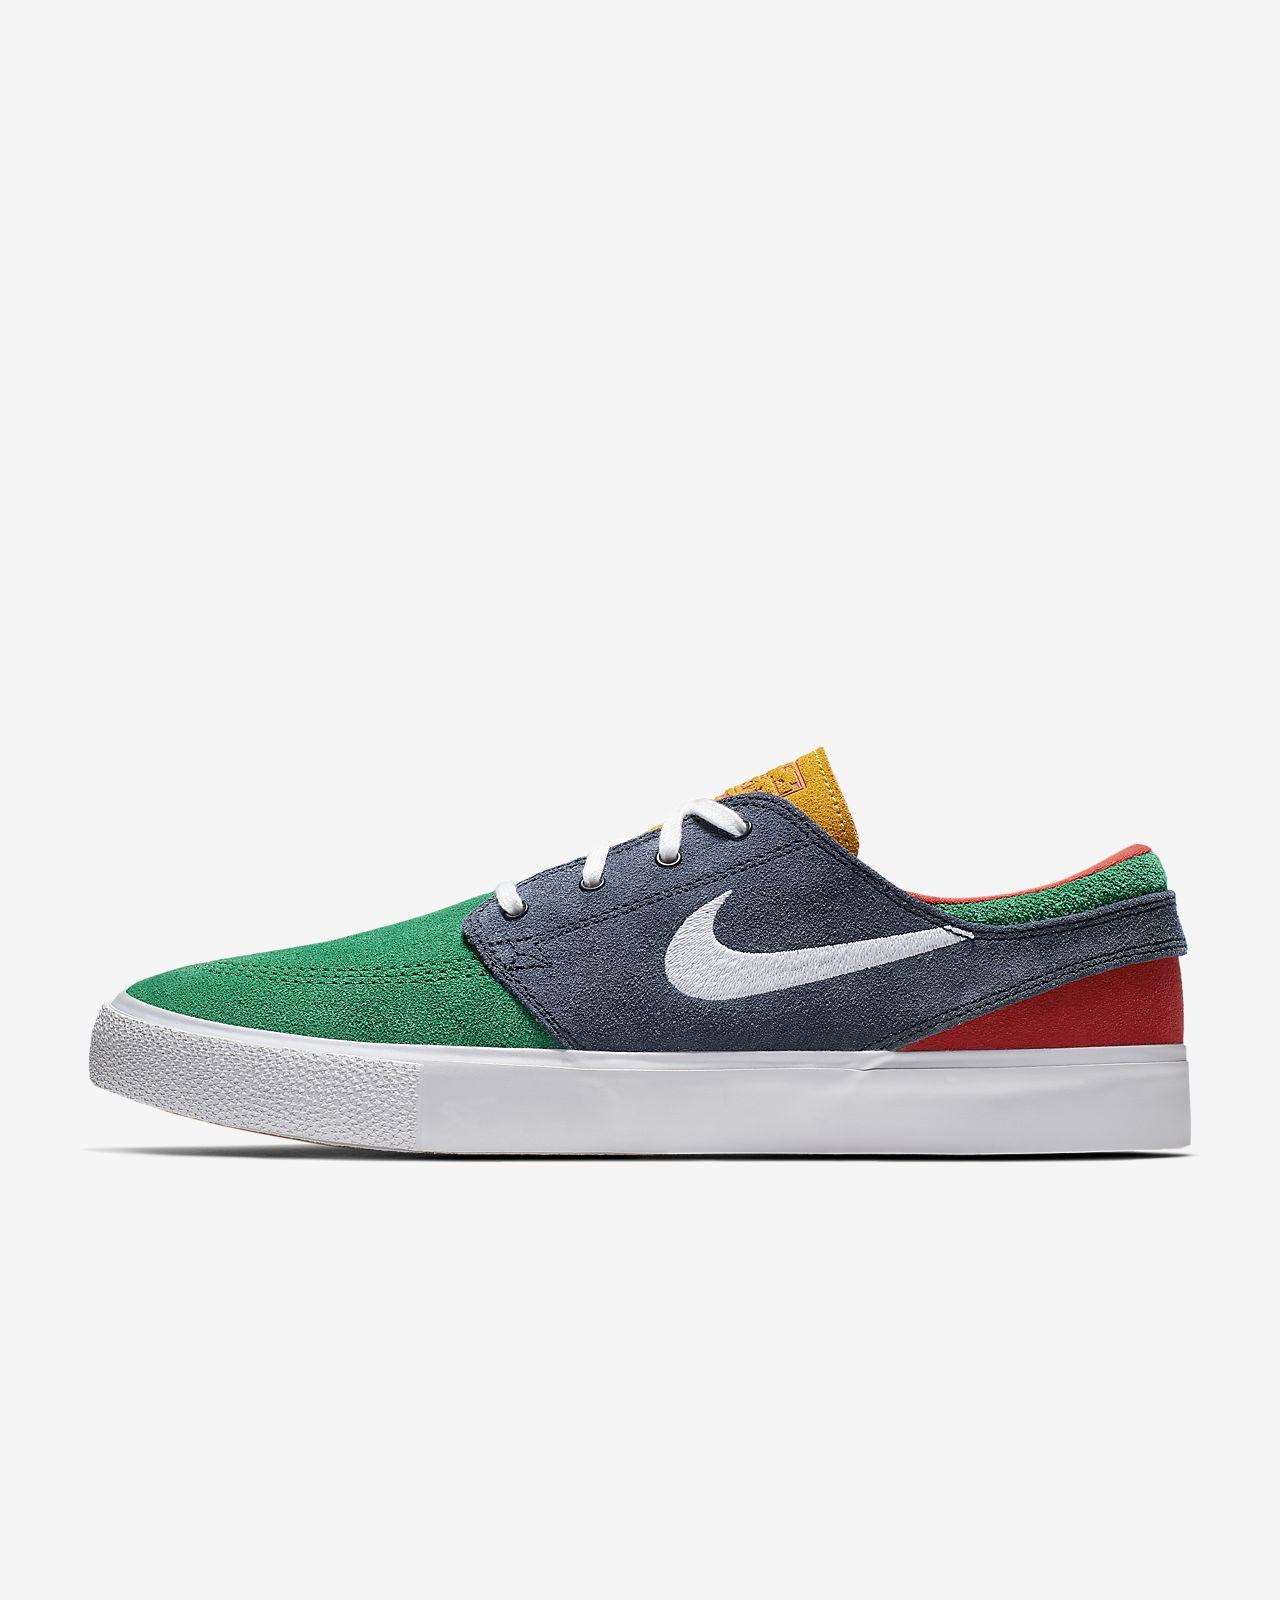 56d0a60dbf98 Nike SB Zoom Janoski RM Skate Shoe. Nike.com GB